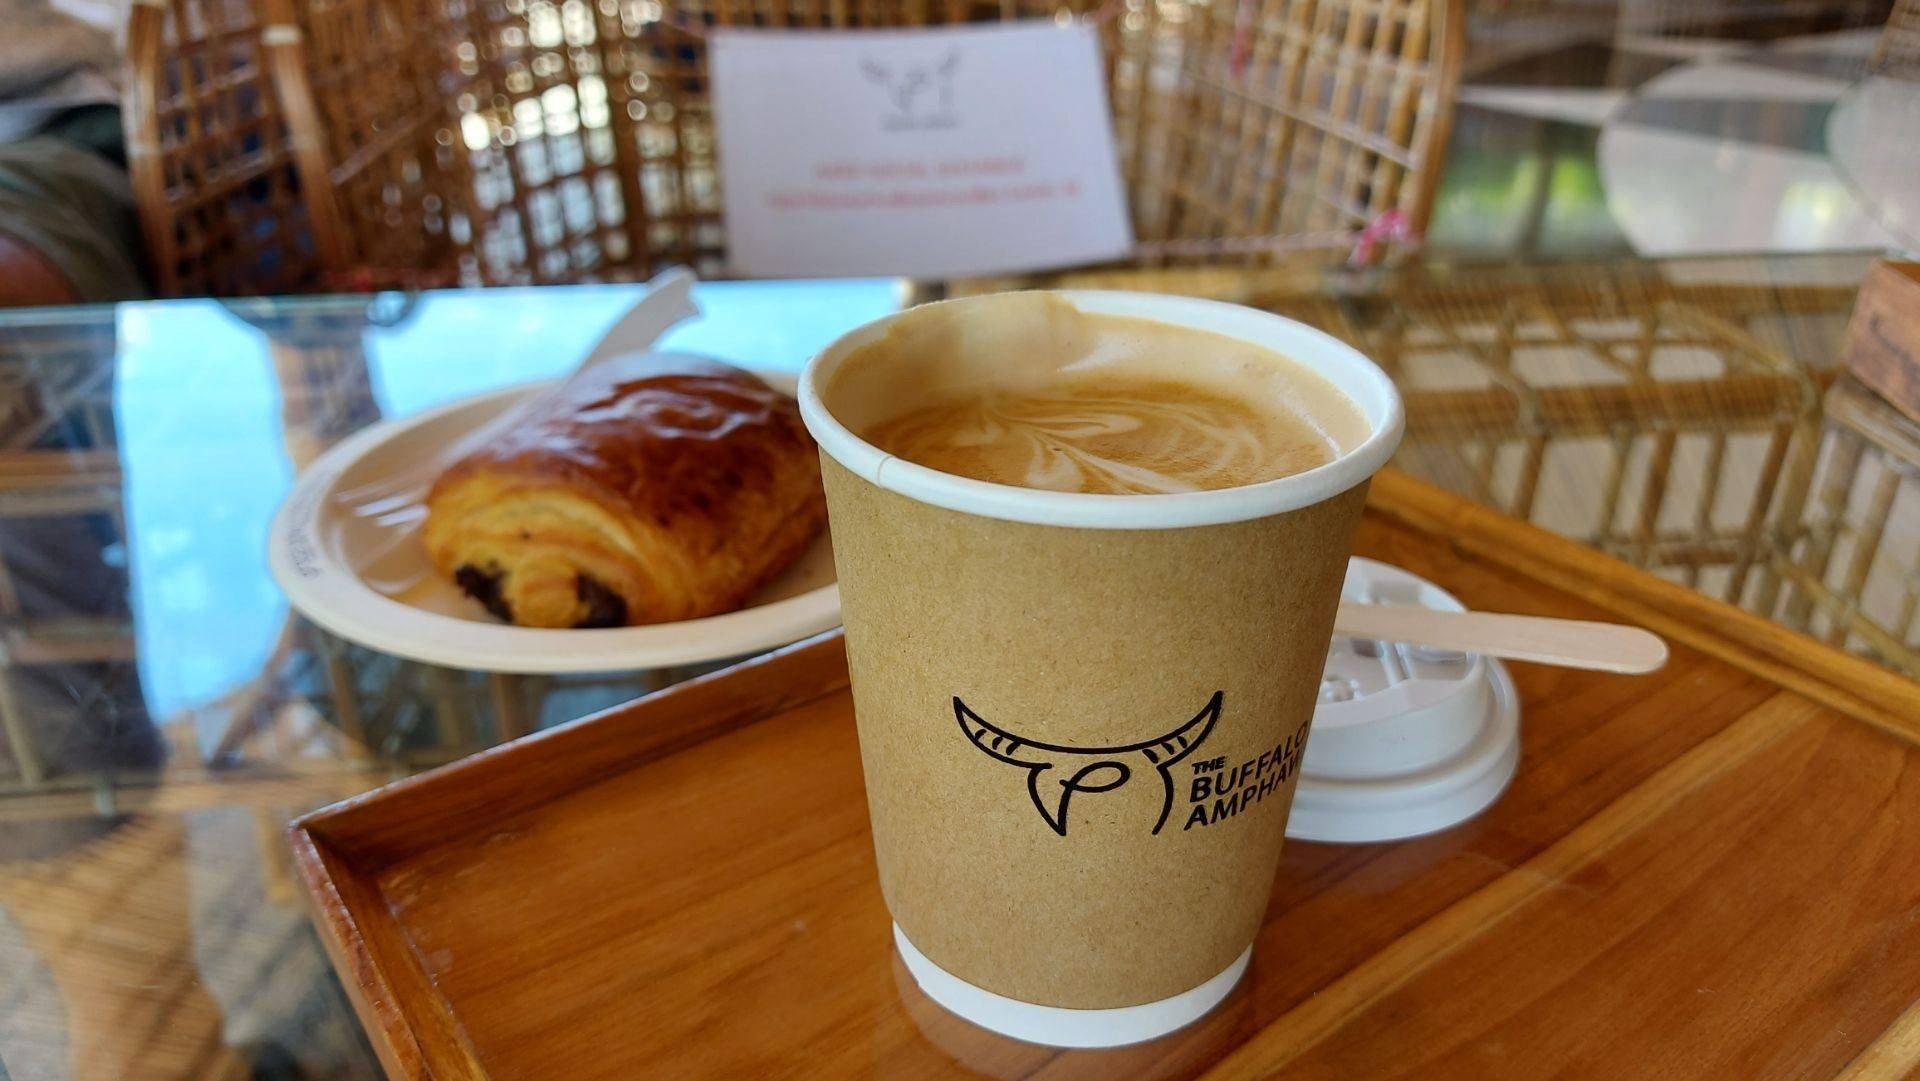 The Buffalo Cafe'